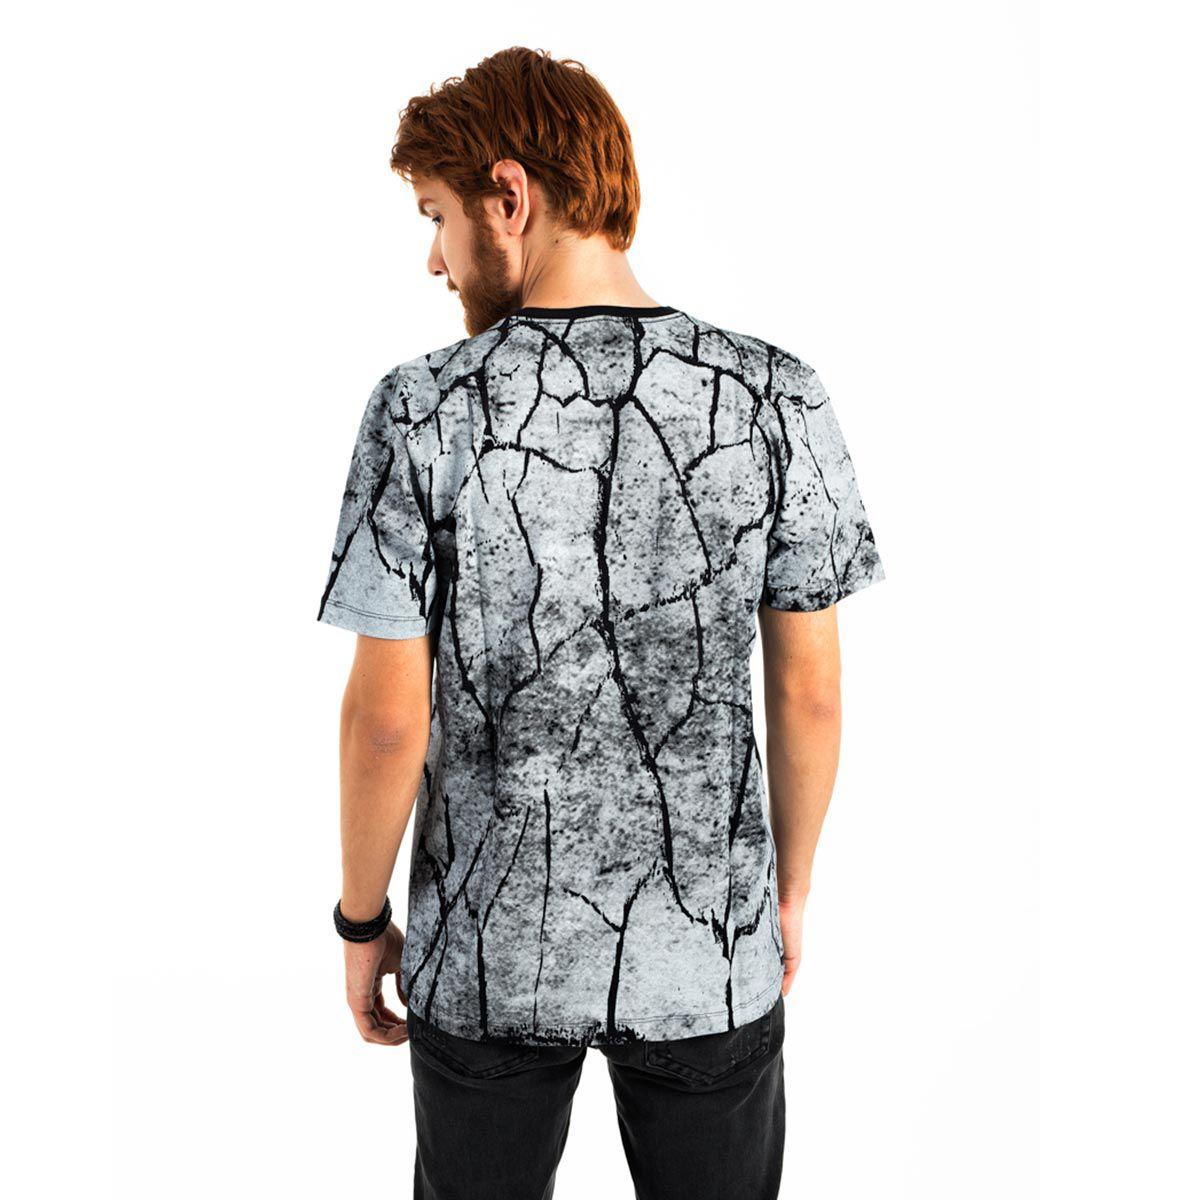 Camiseta AES 1975 Marble